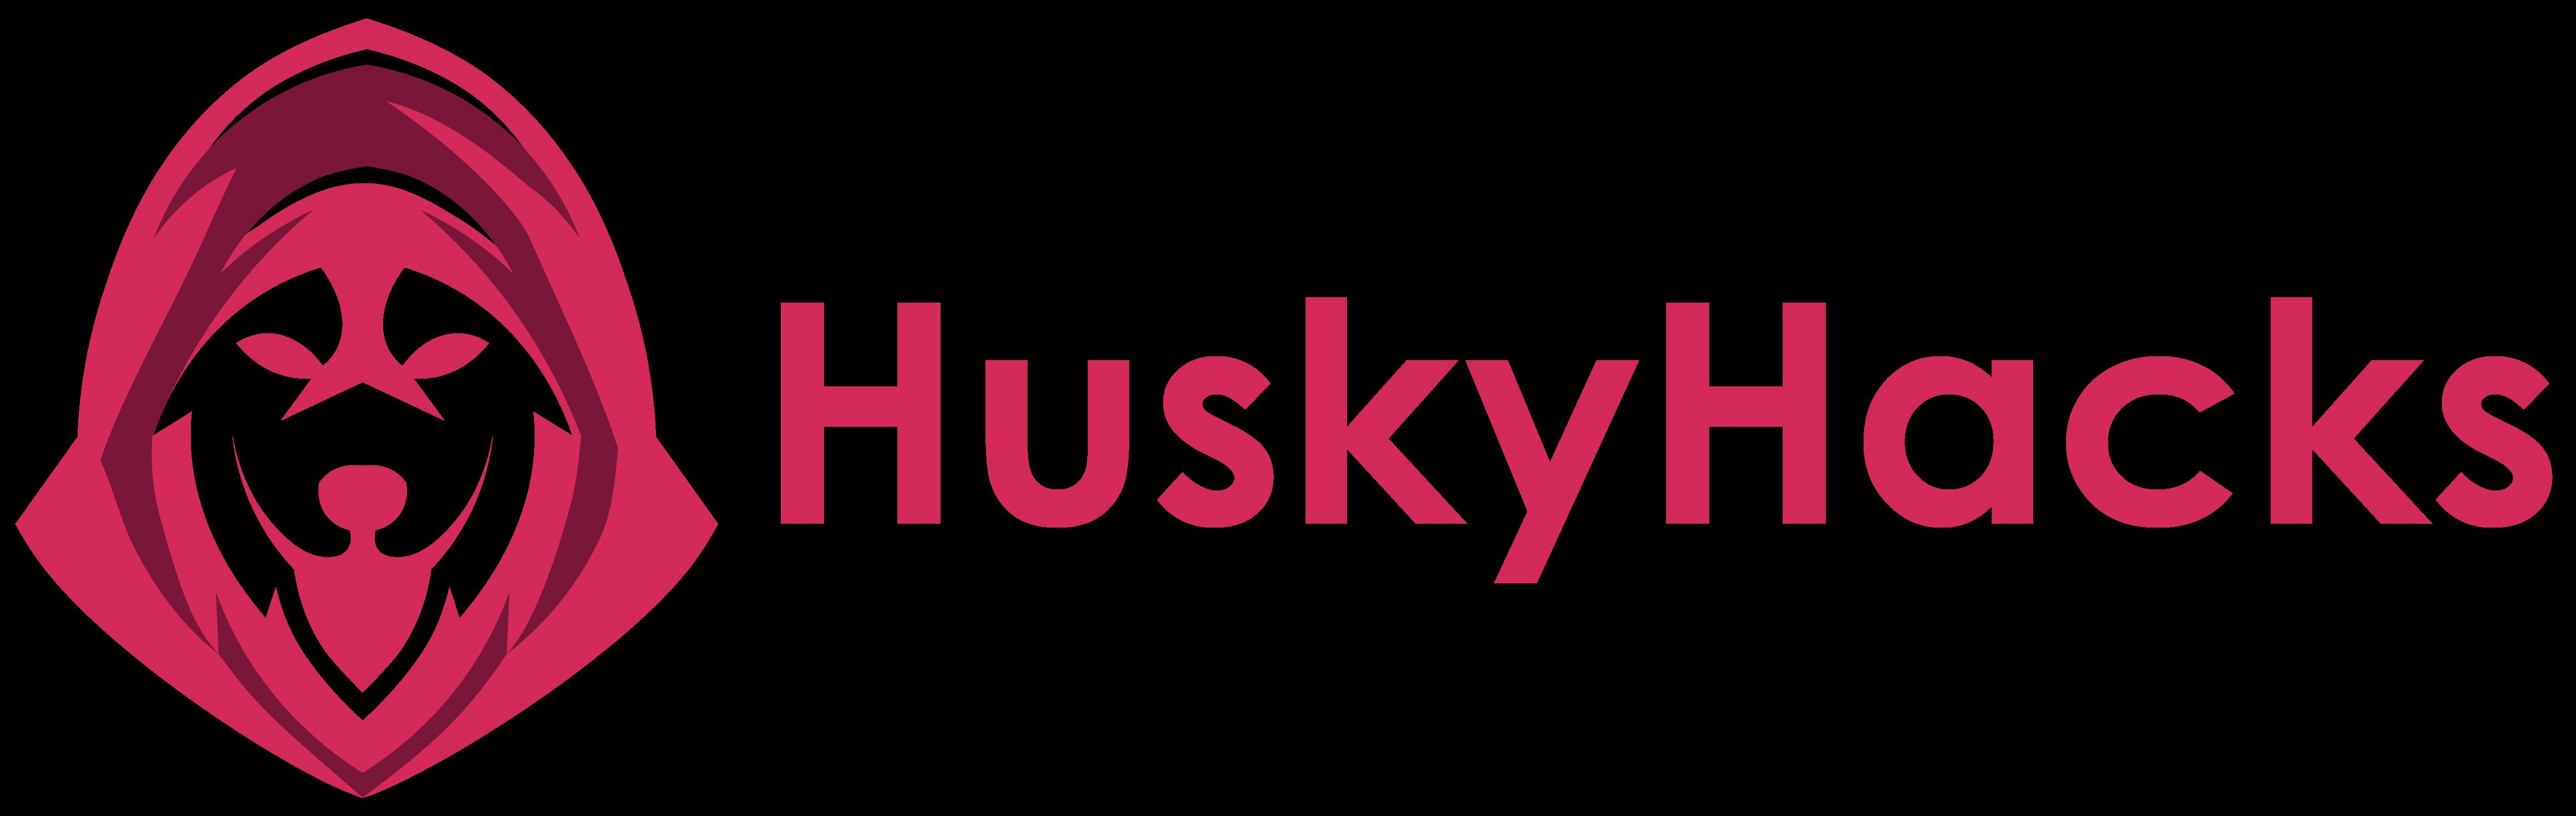 HuskyHacks